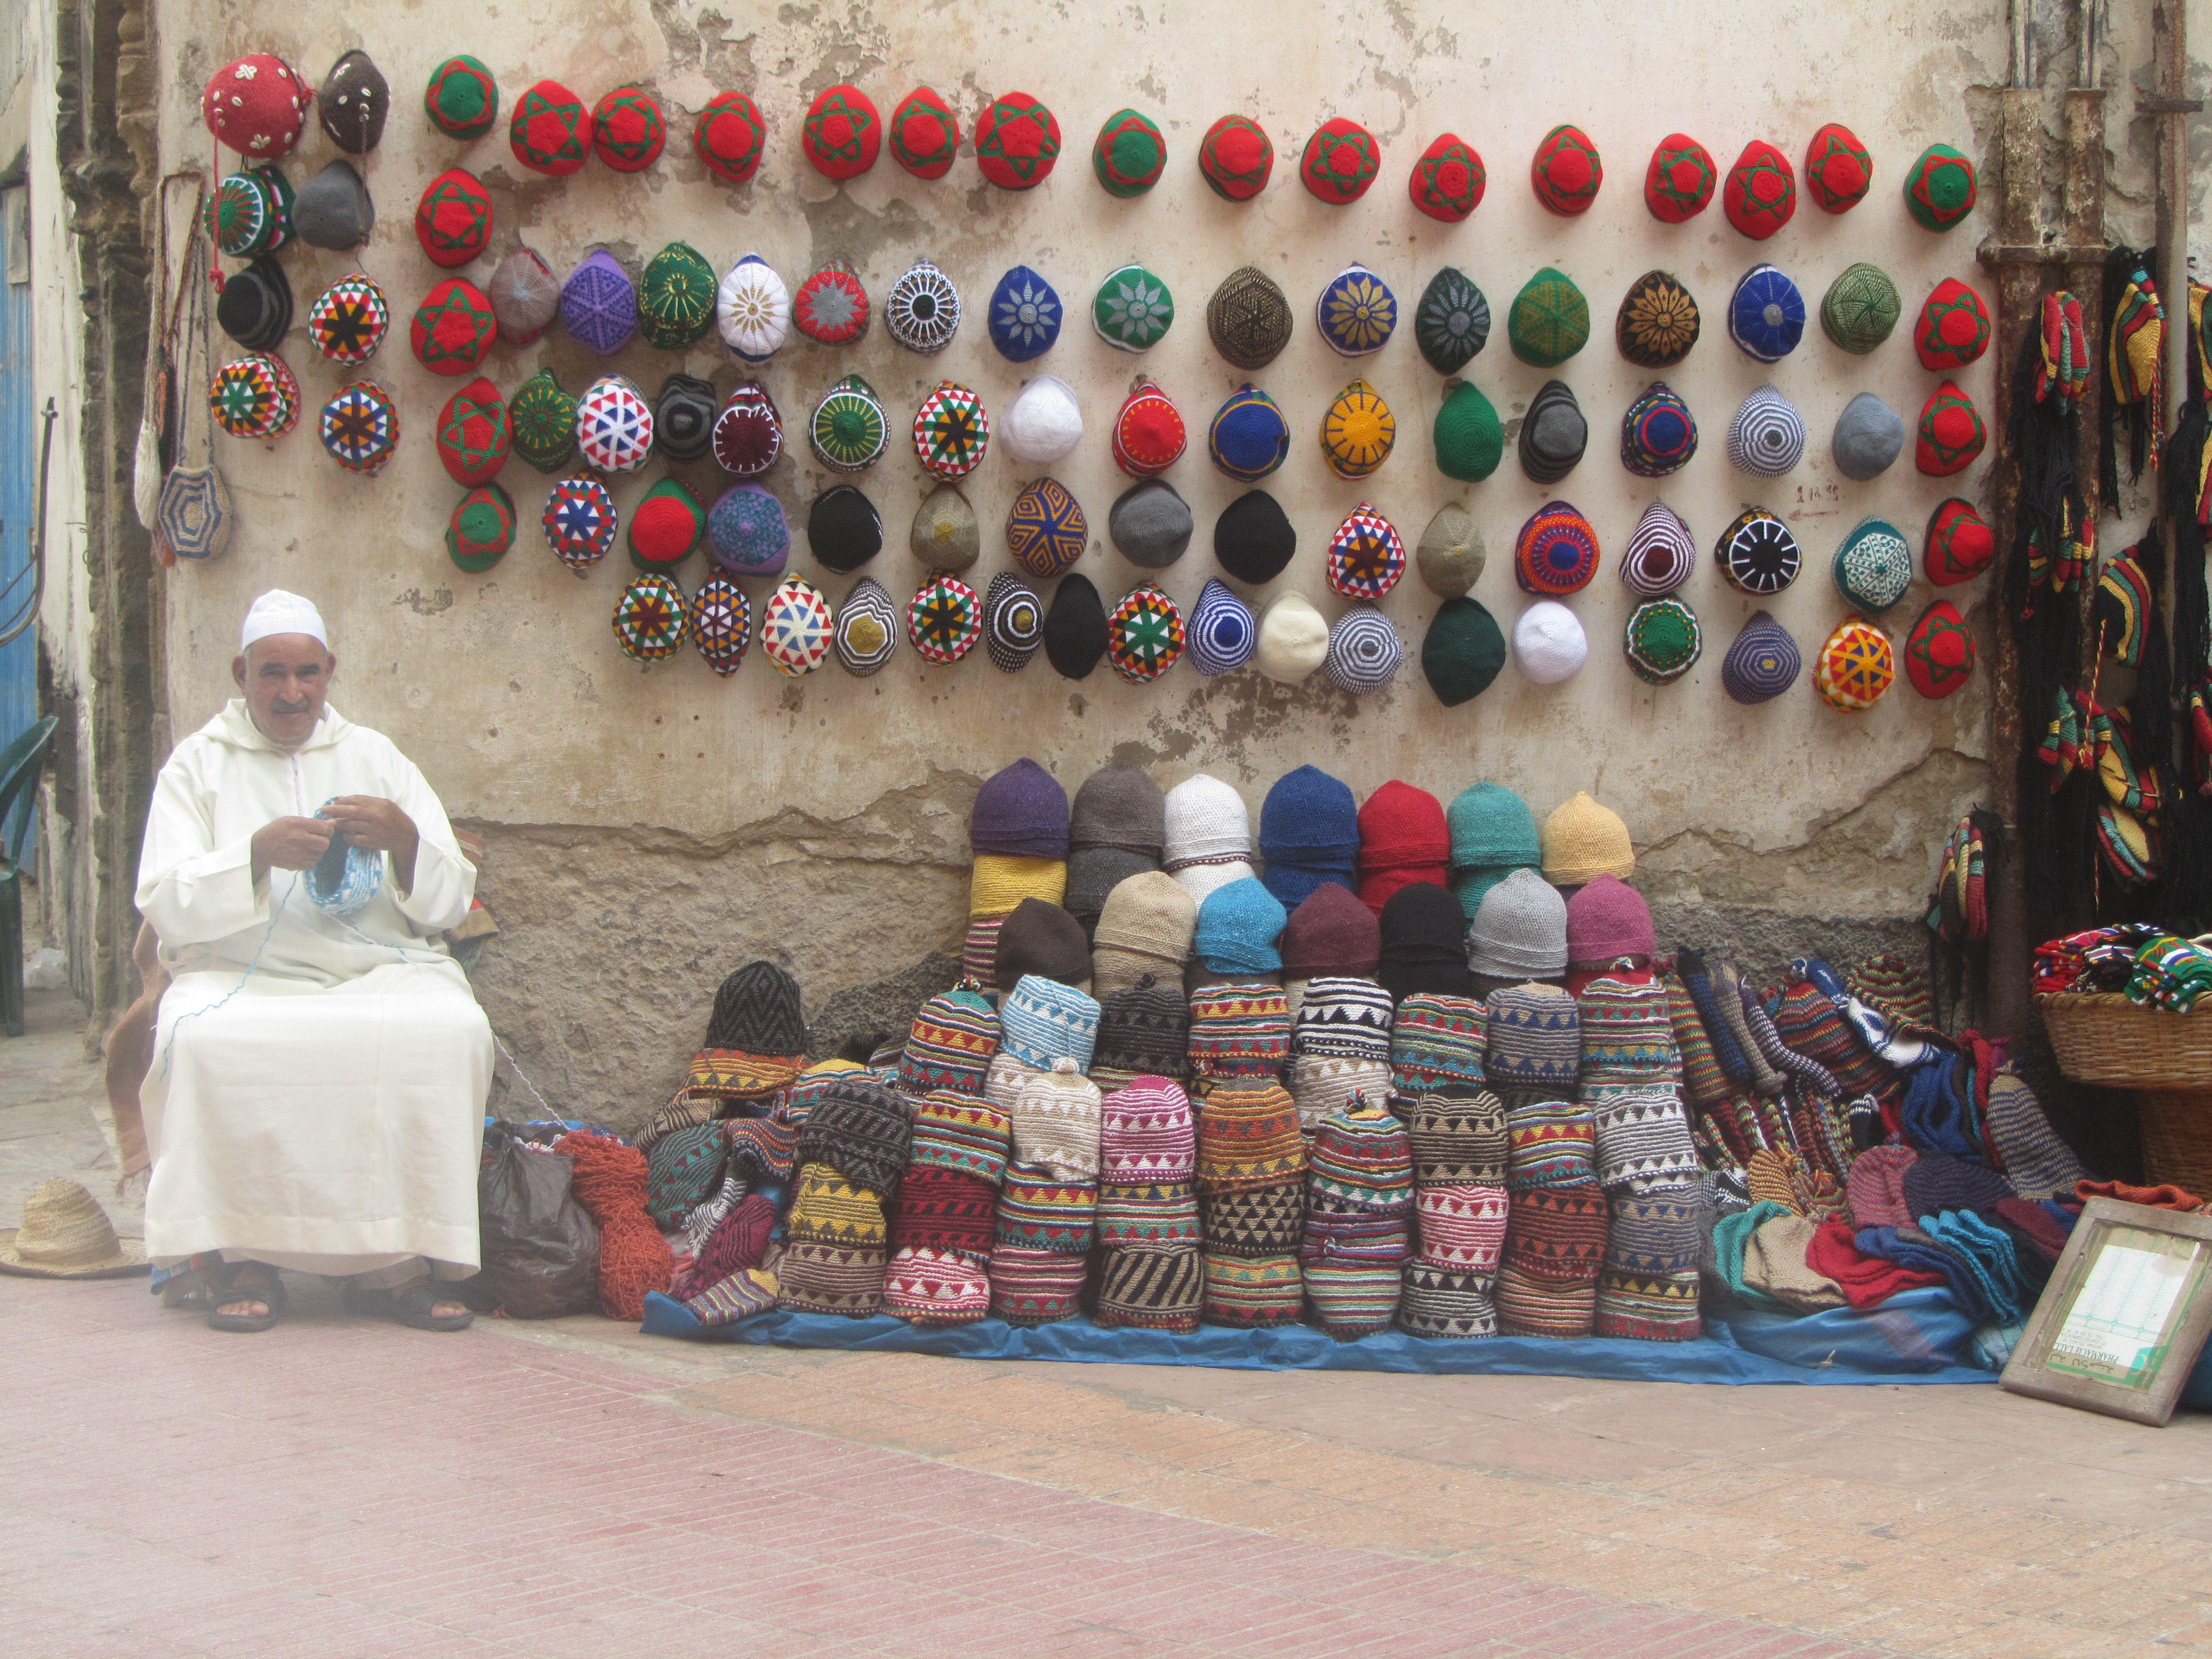 Marocain tricotant le couvre-chef traditionnel